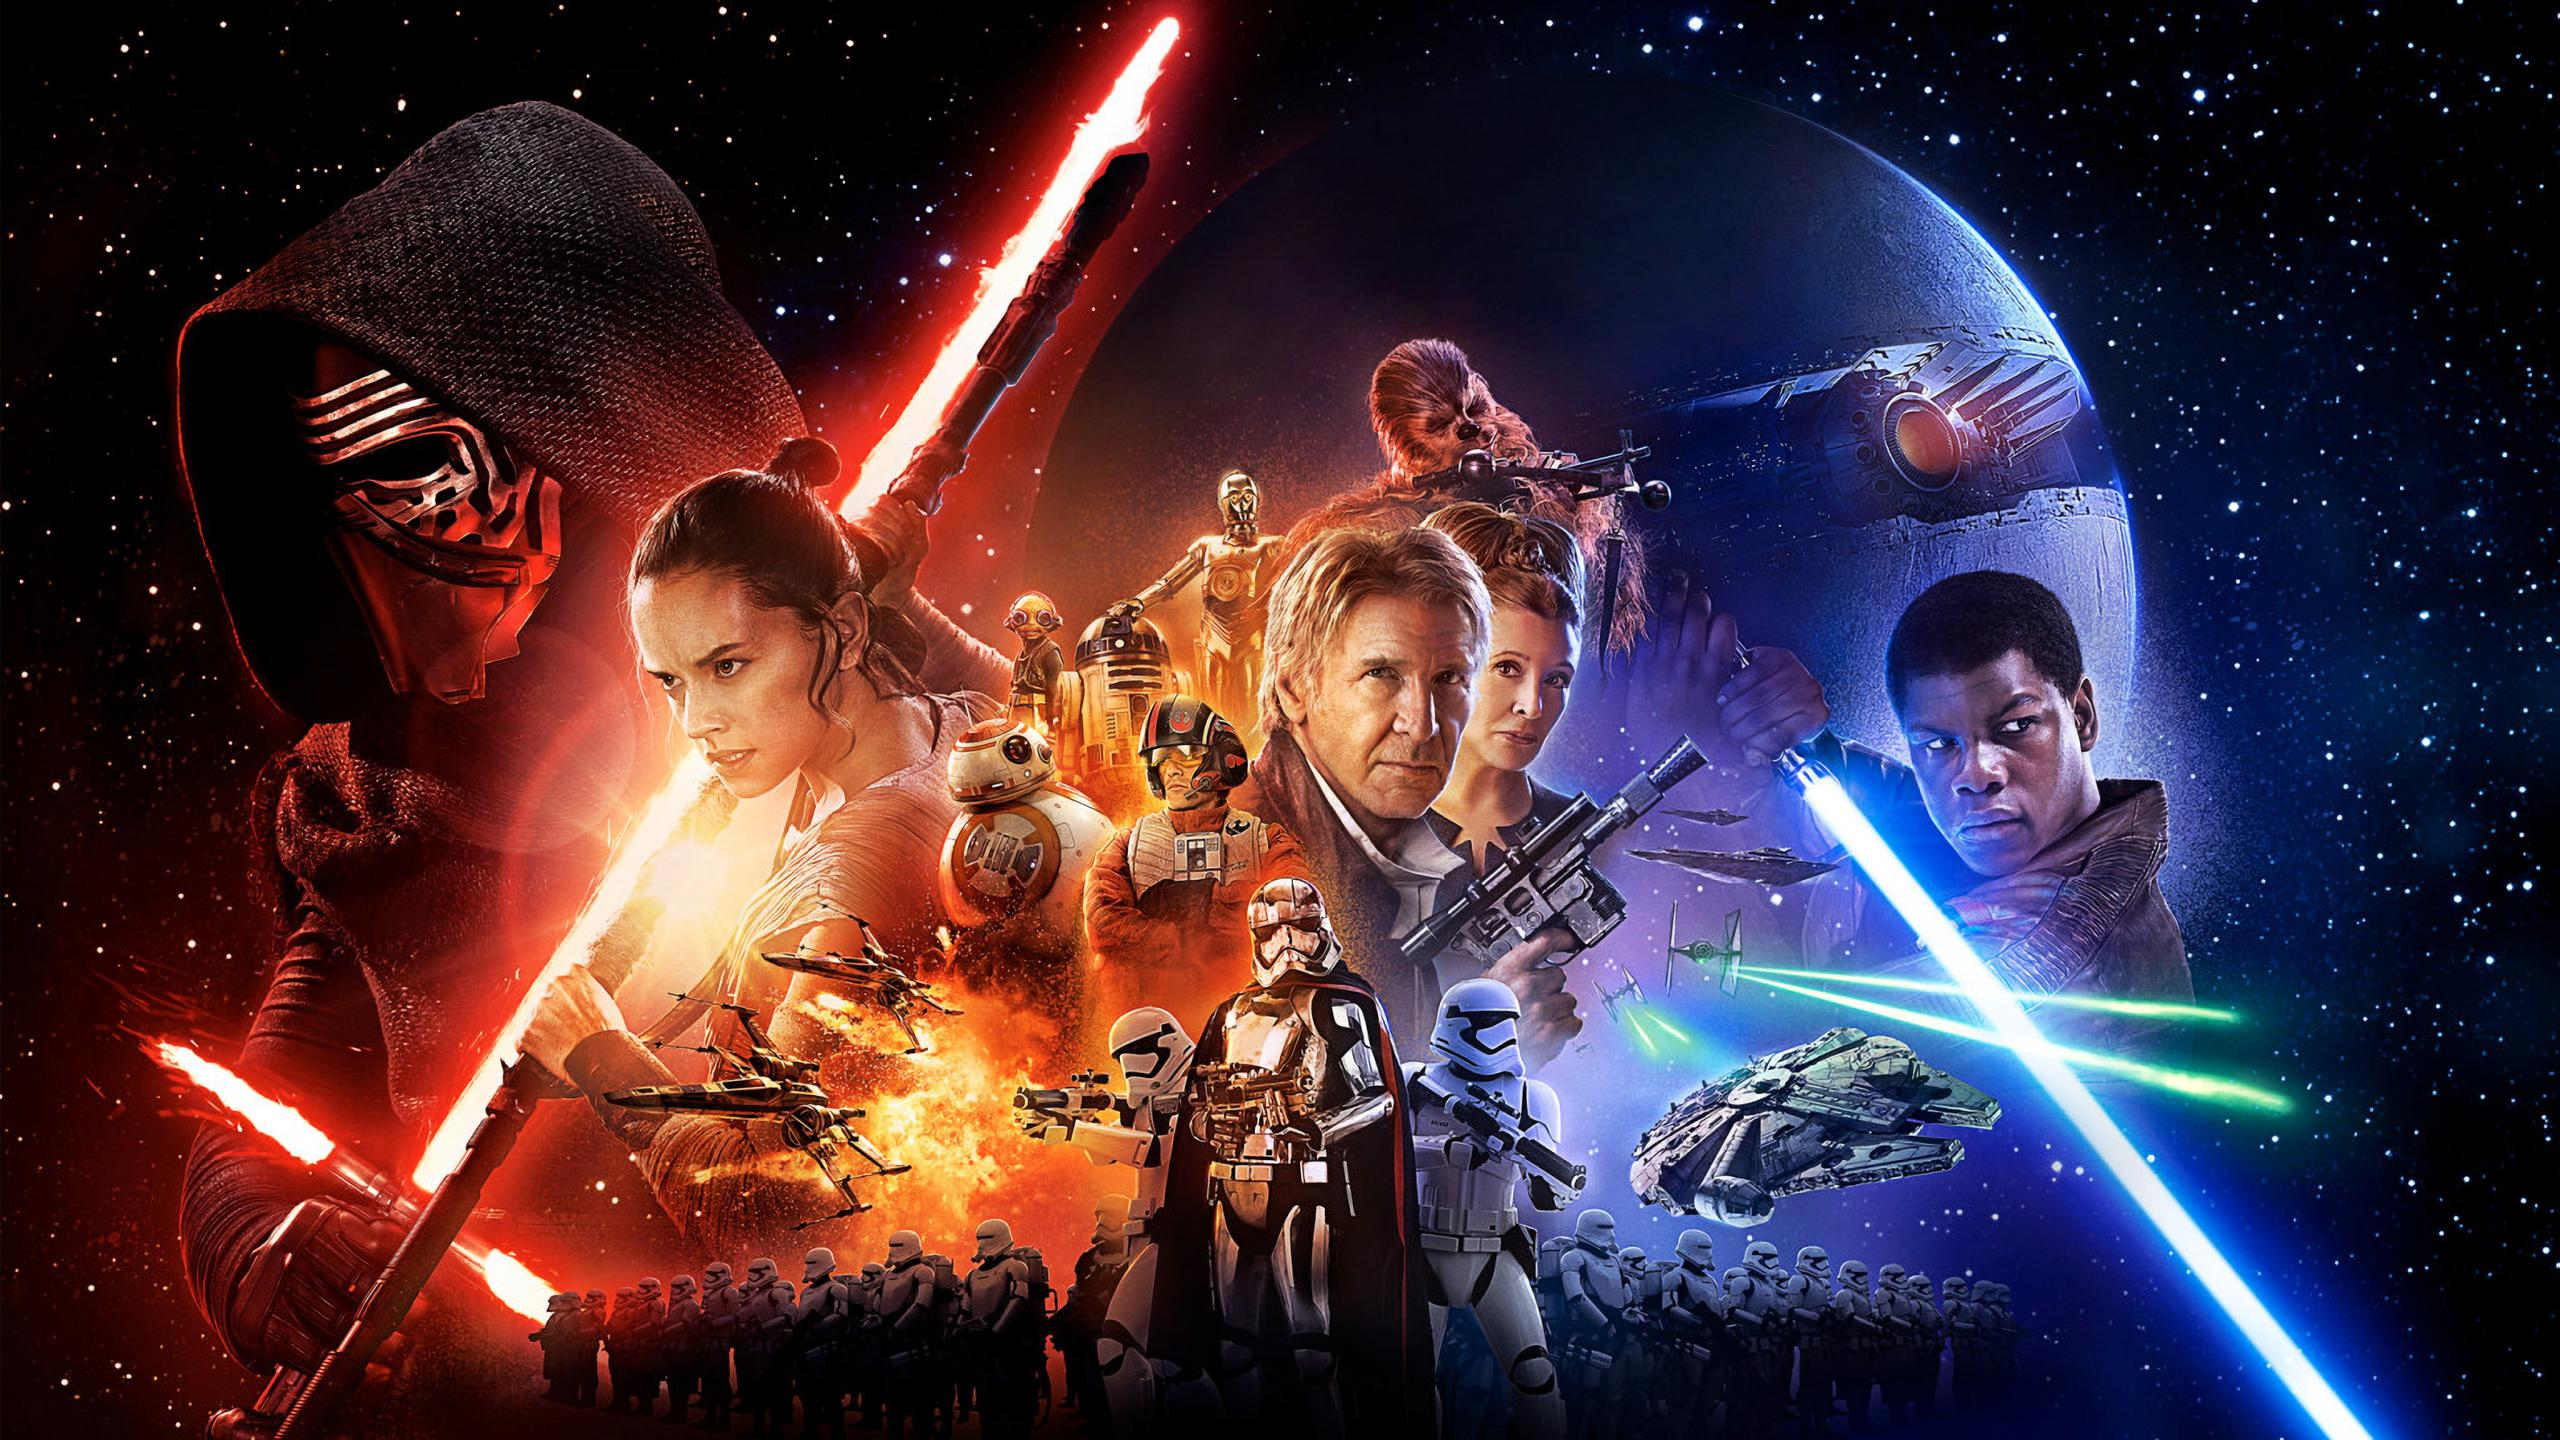 18 Kendaraan 'Star Wars' terbaik ini tak dapat pergi ke luar angkasa